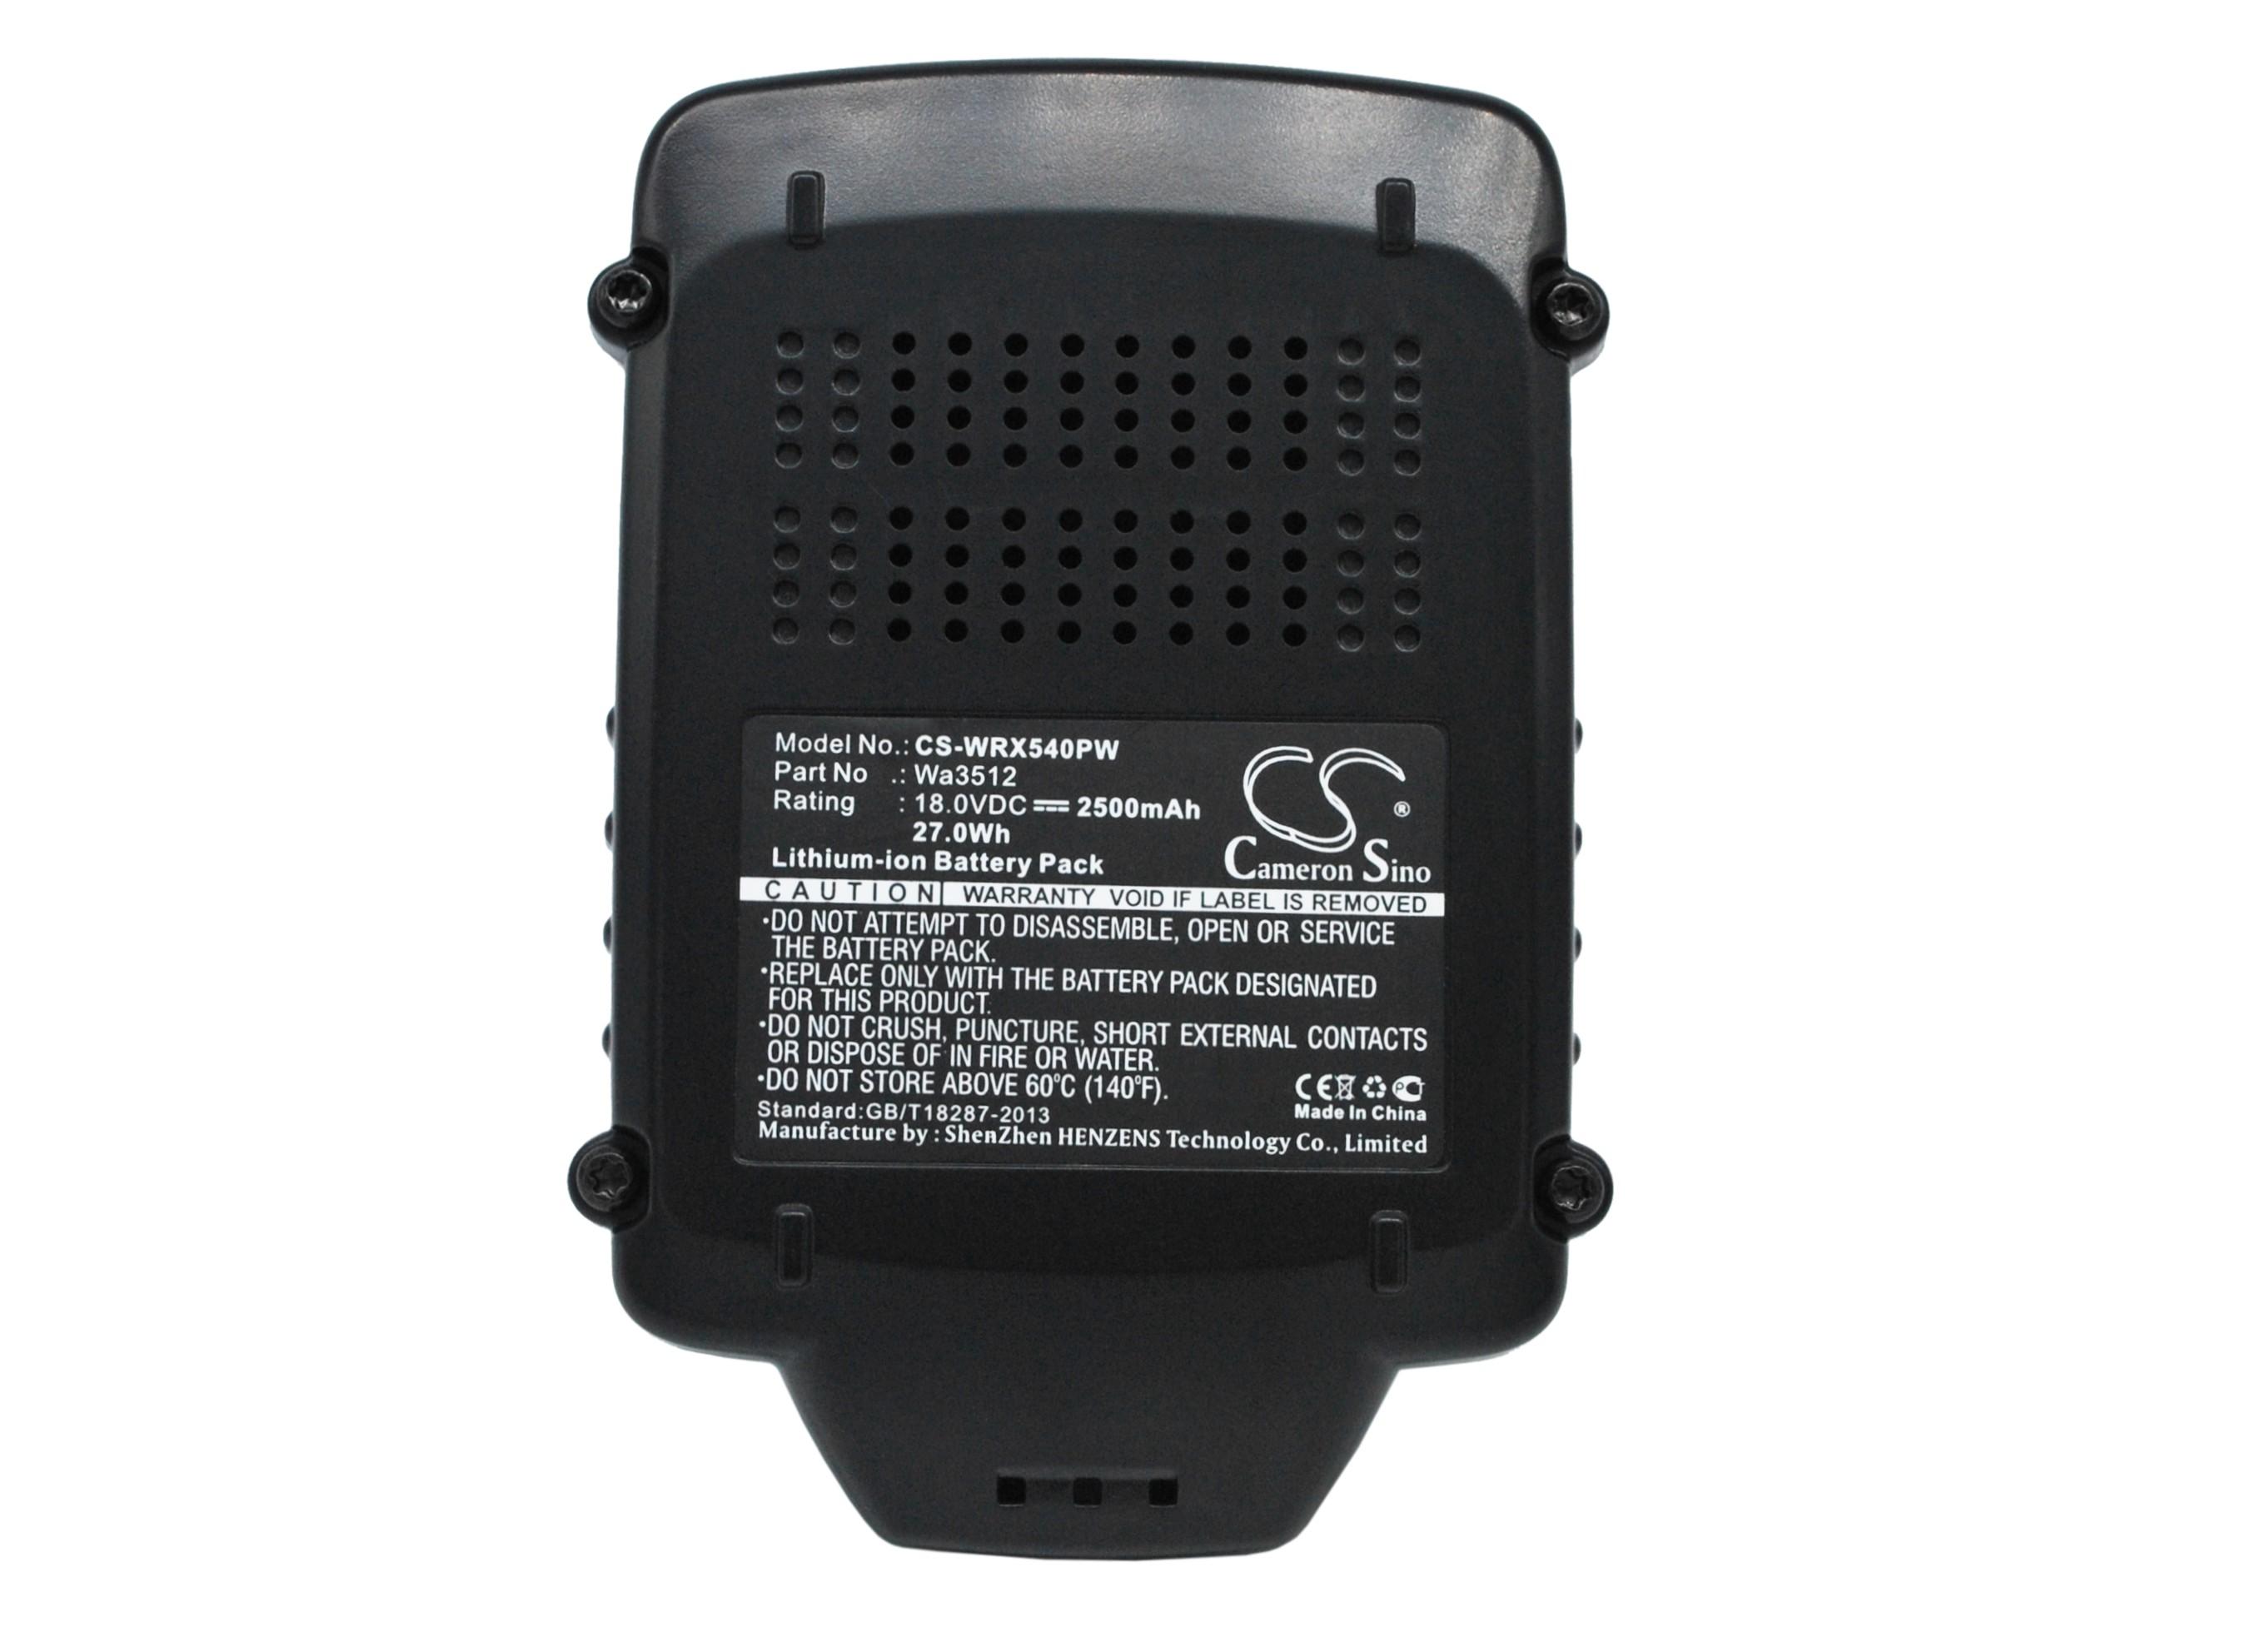 Cameron Sino baterie do nářadí pro AL-KO Trimmer GTLi 18V Comfort 18V Li-ion 1500mAh černá - neoriginální